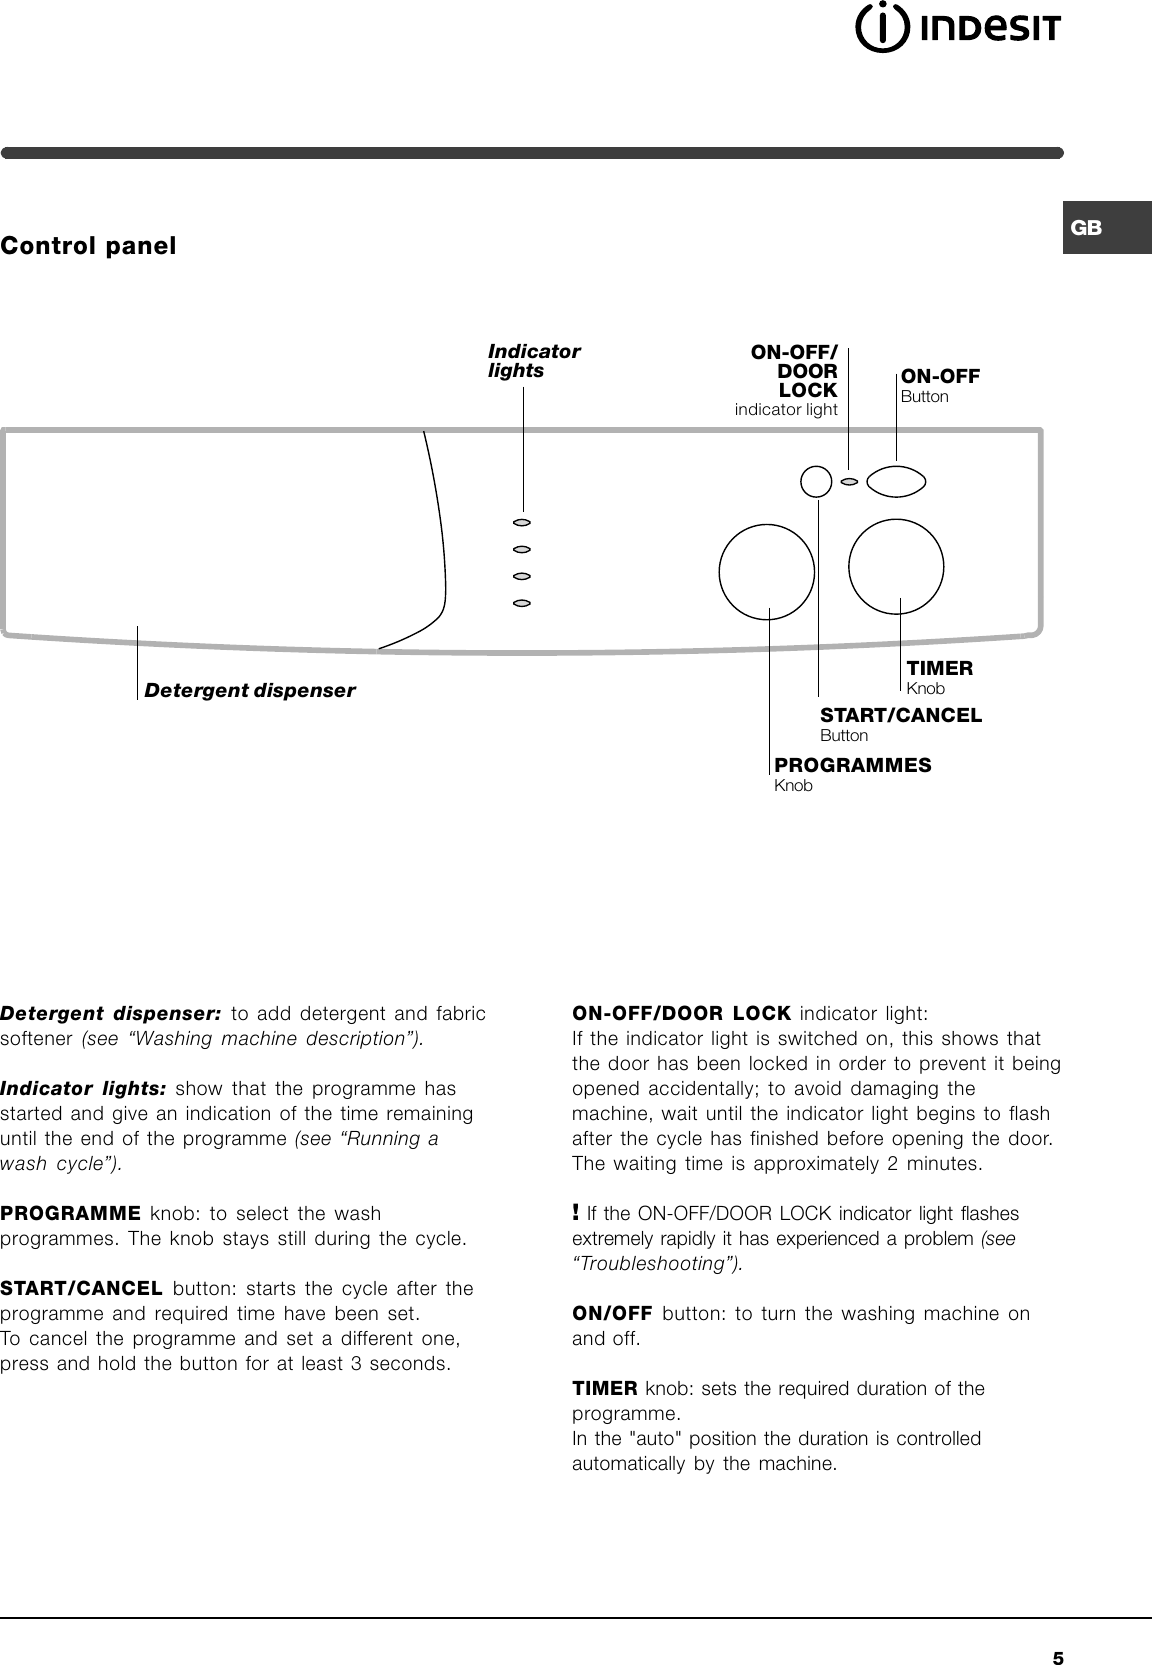 Indesit washing machine symbols image collections symbol and indesit washing machine wixl 1200 ot instruction manual gbwixl page 5 of indesit indesit washing machine fandeluxe Choice Image